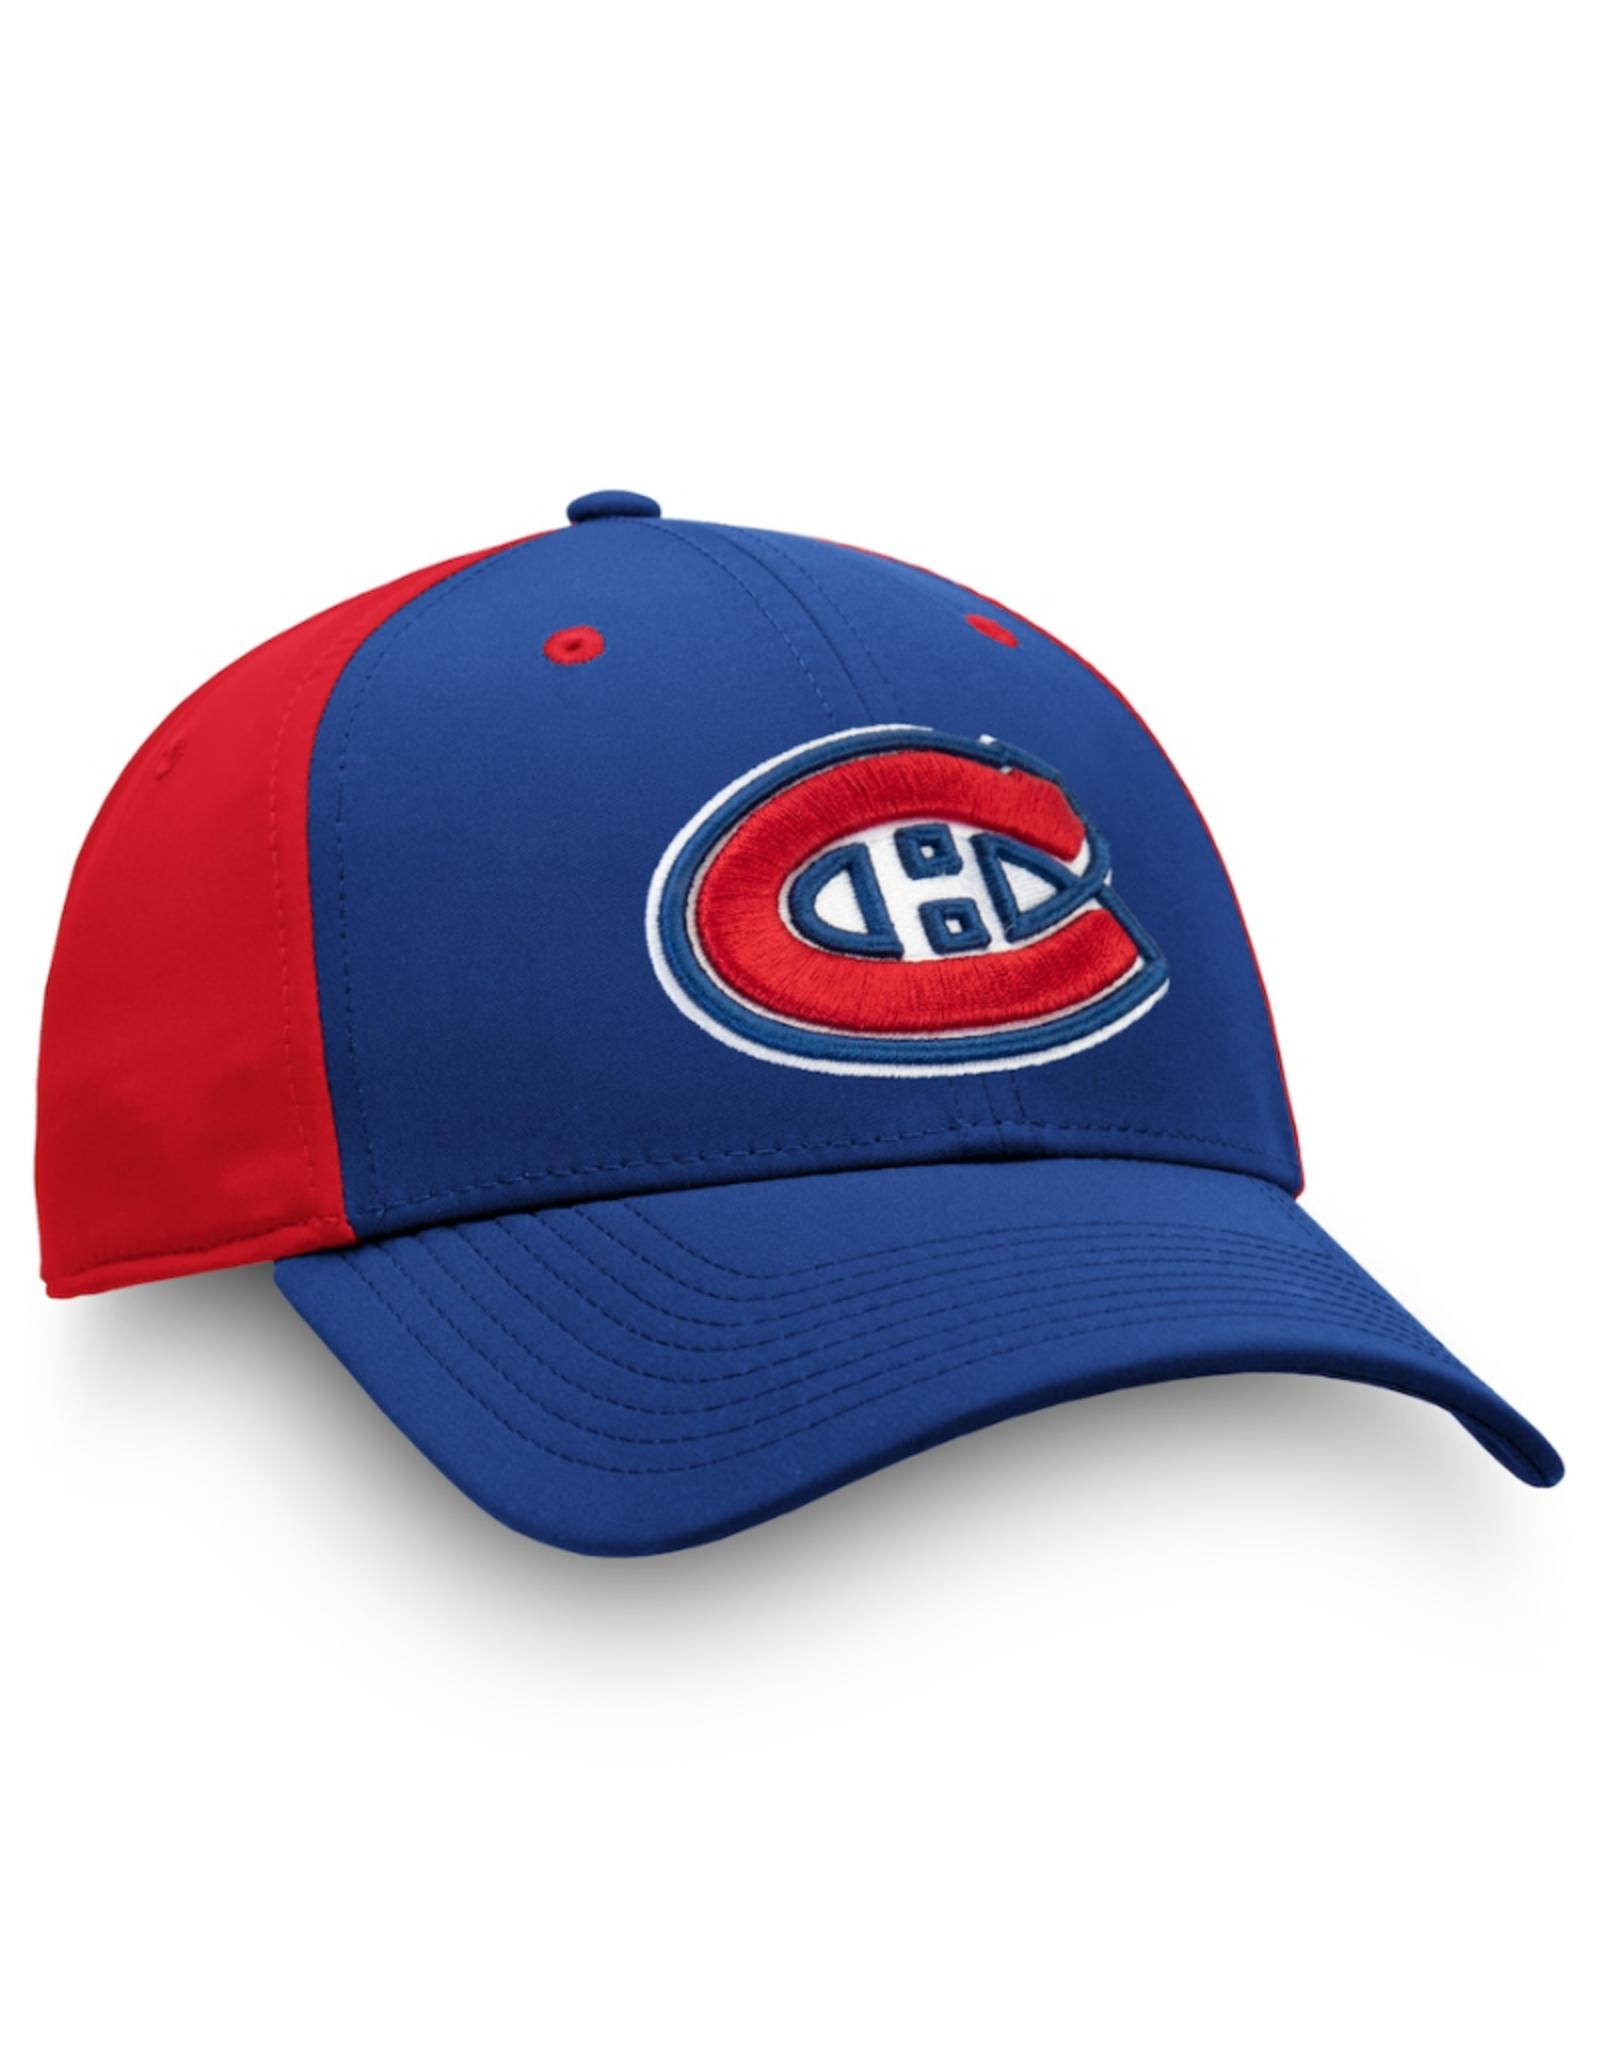 Fanatics Fanatics Men's Iconic Stretch Hat Montreal Canadiens Blue/Red